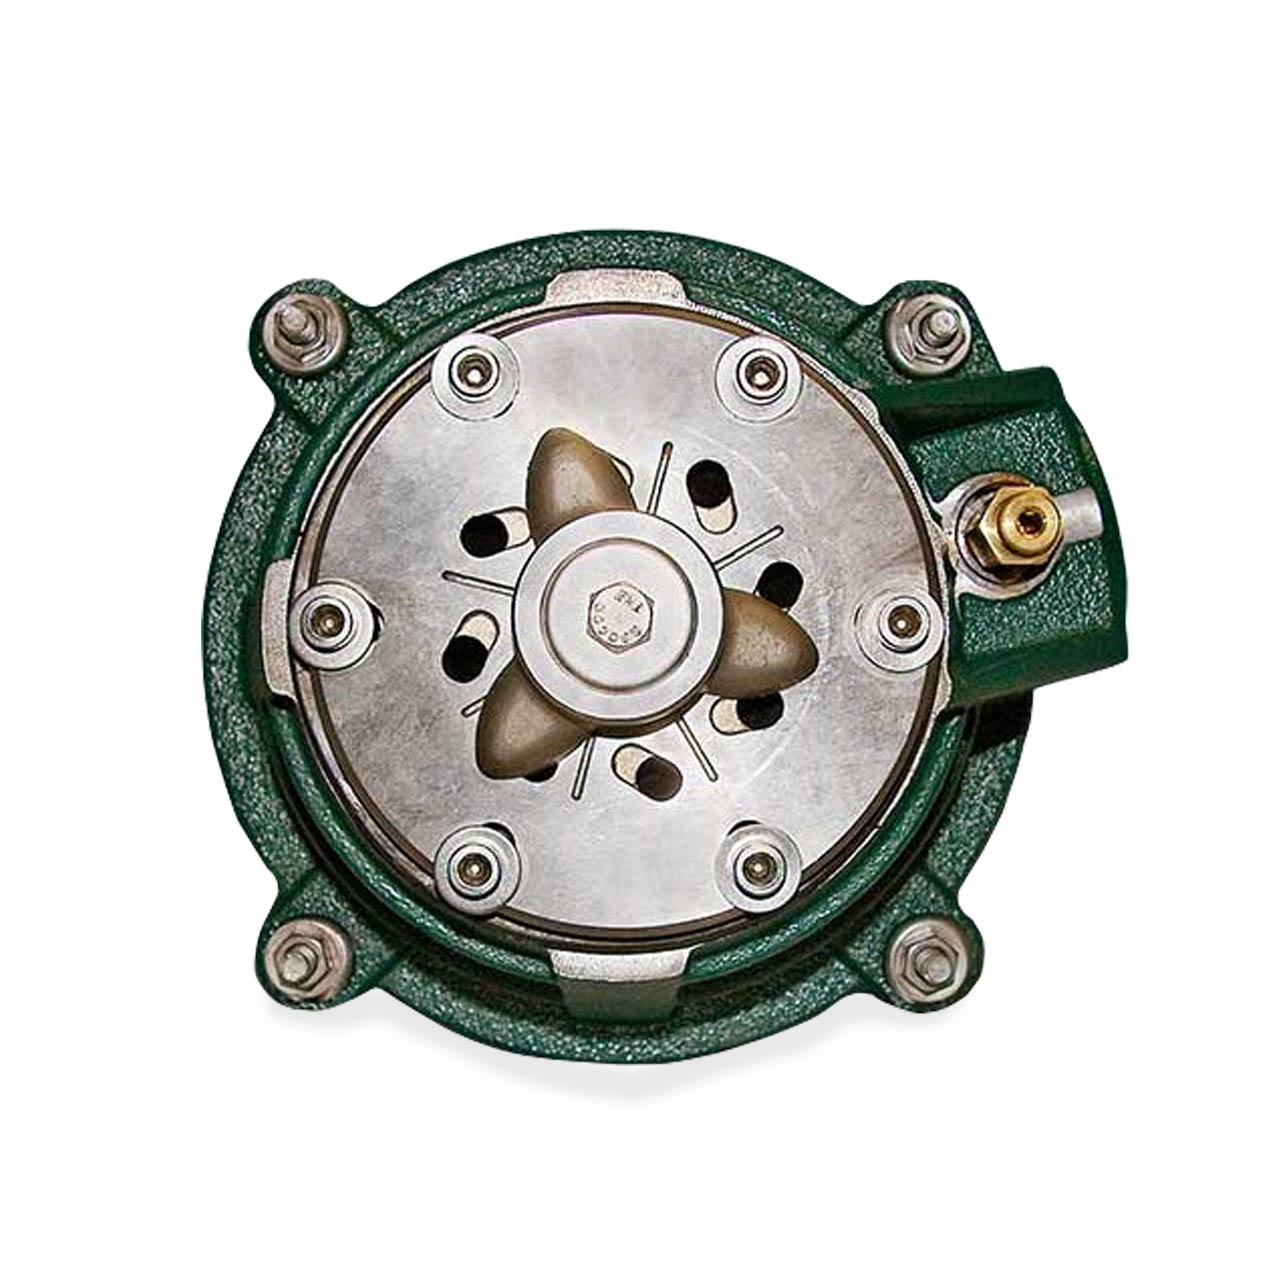 Zoeller 8150004 Model E815 Shark Progressing Cavity Grinder Pump 20 HP 230V 1PH 20 Cord Nonautomatic